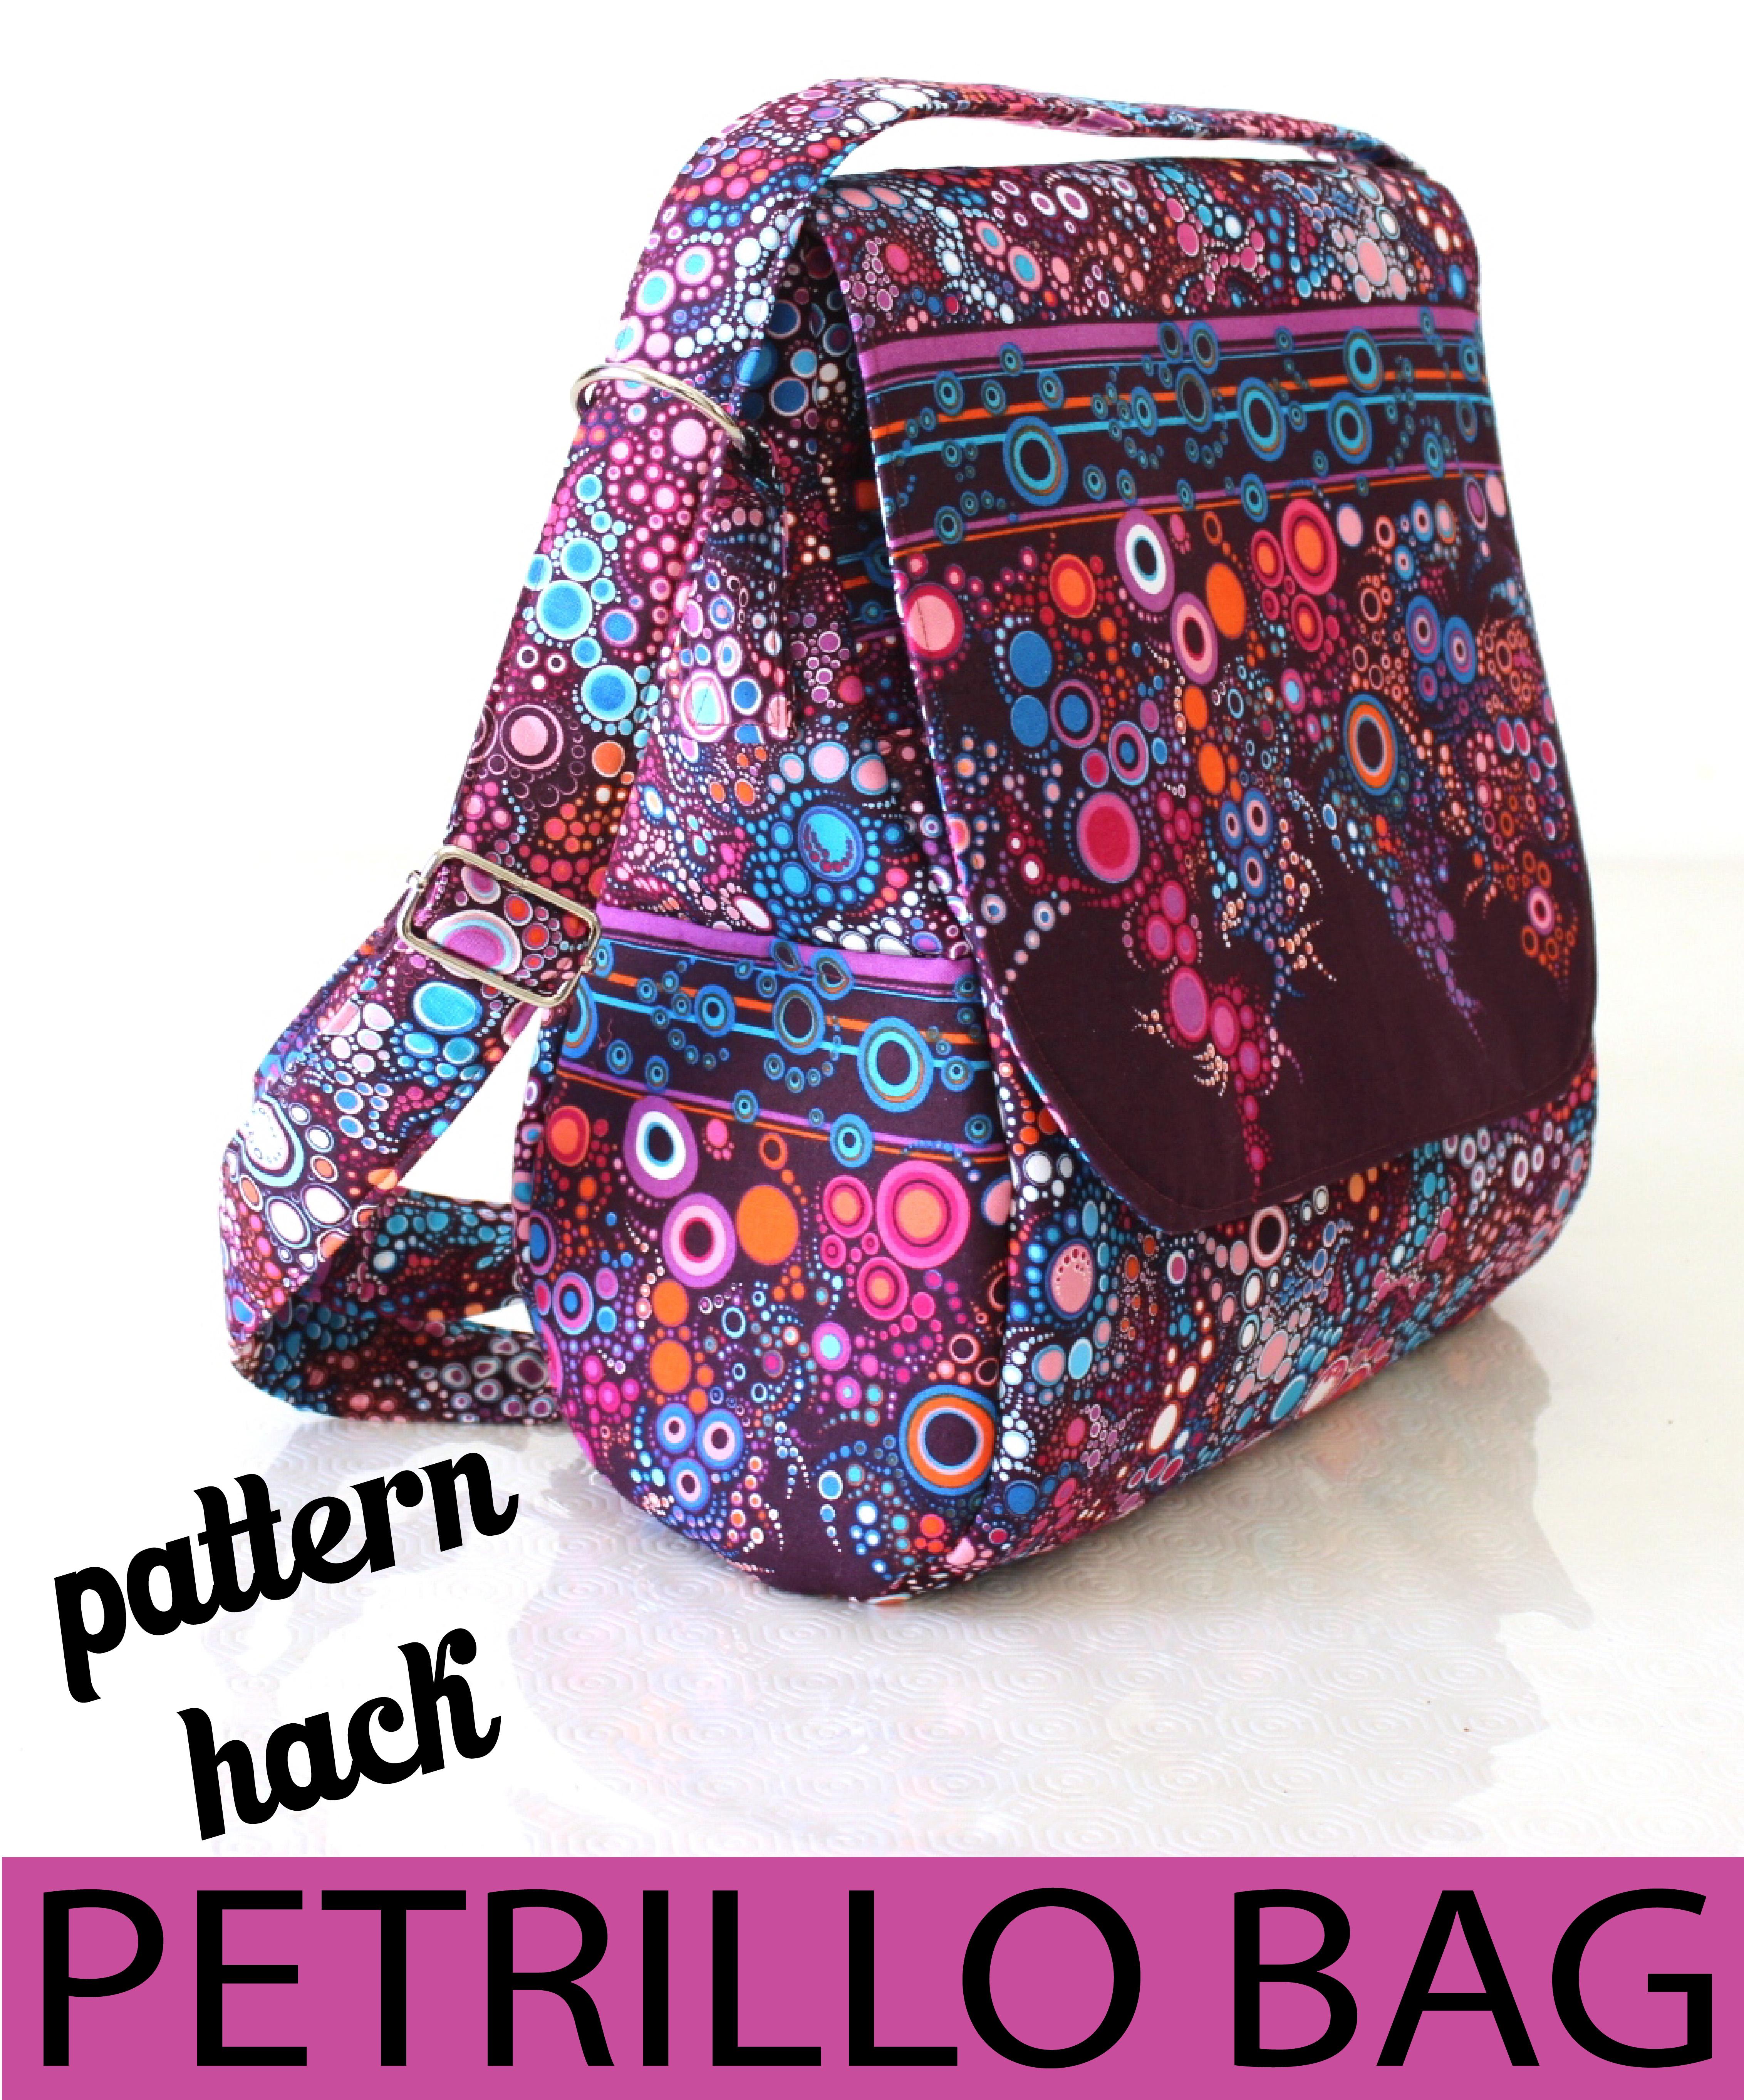 Sew Sweetness Petrillo Bag pattern hack